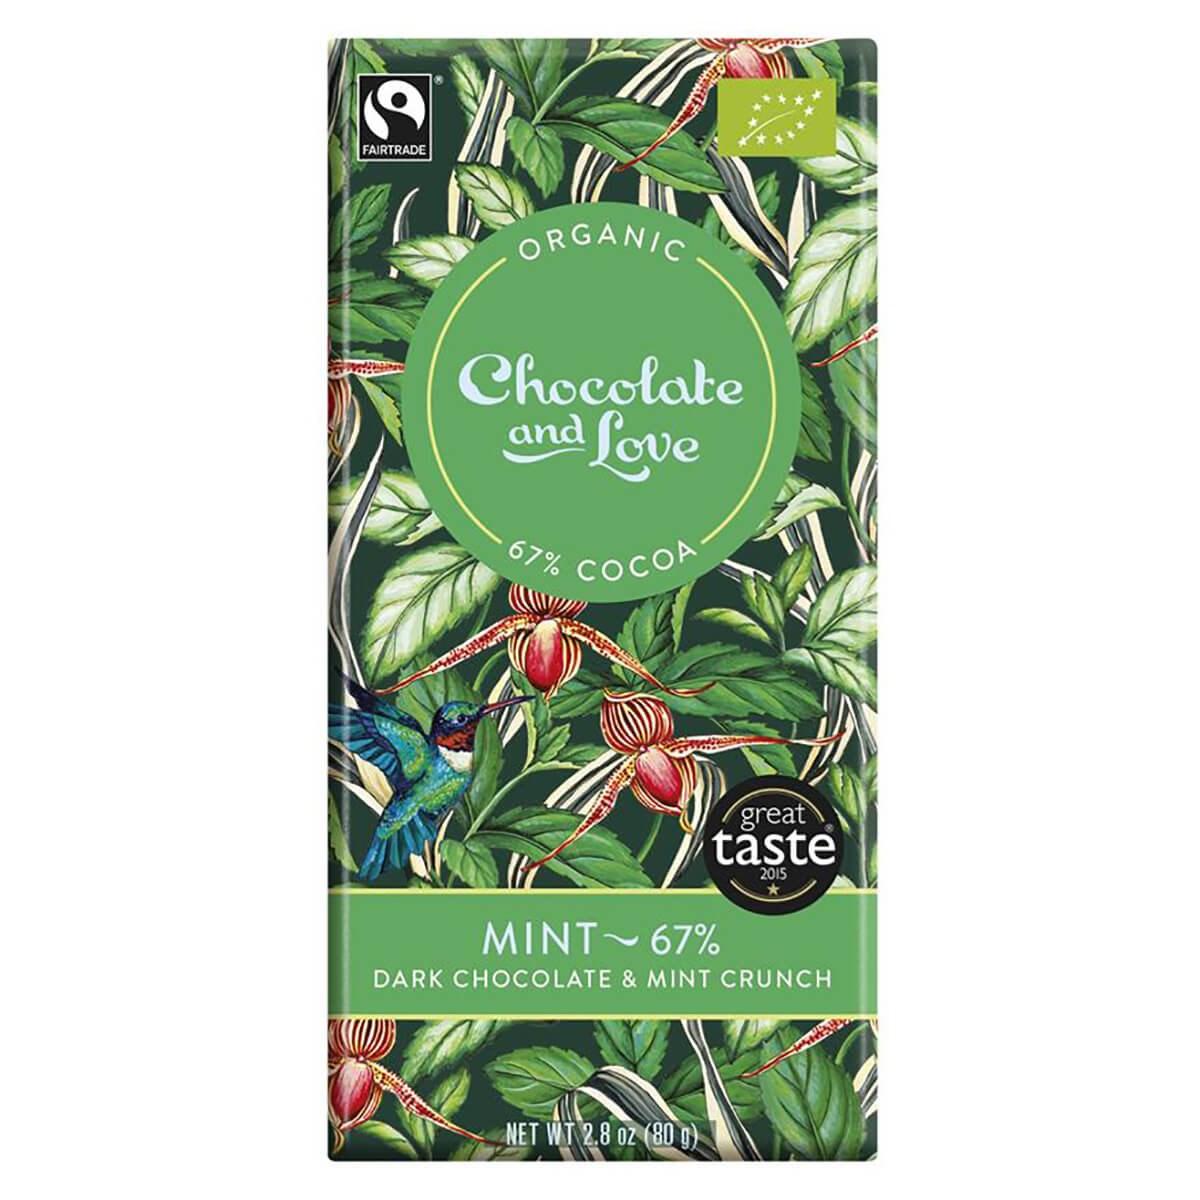 Chocolate and Love Organic & Fairtrade 67% Dark Chocolate with Mint Crunch